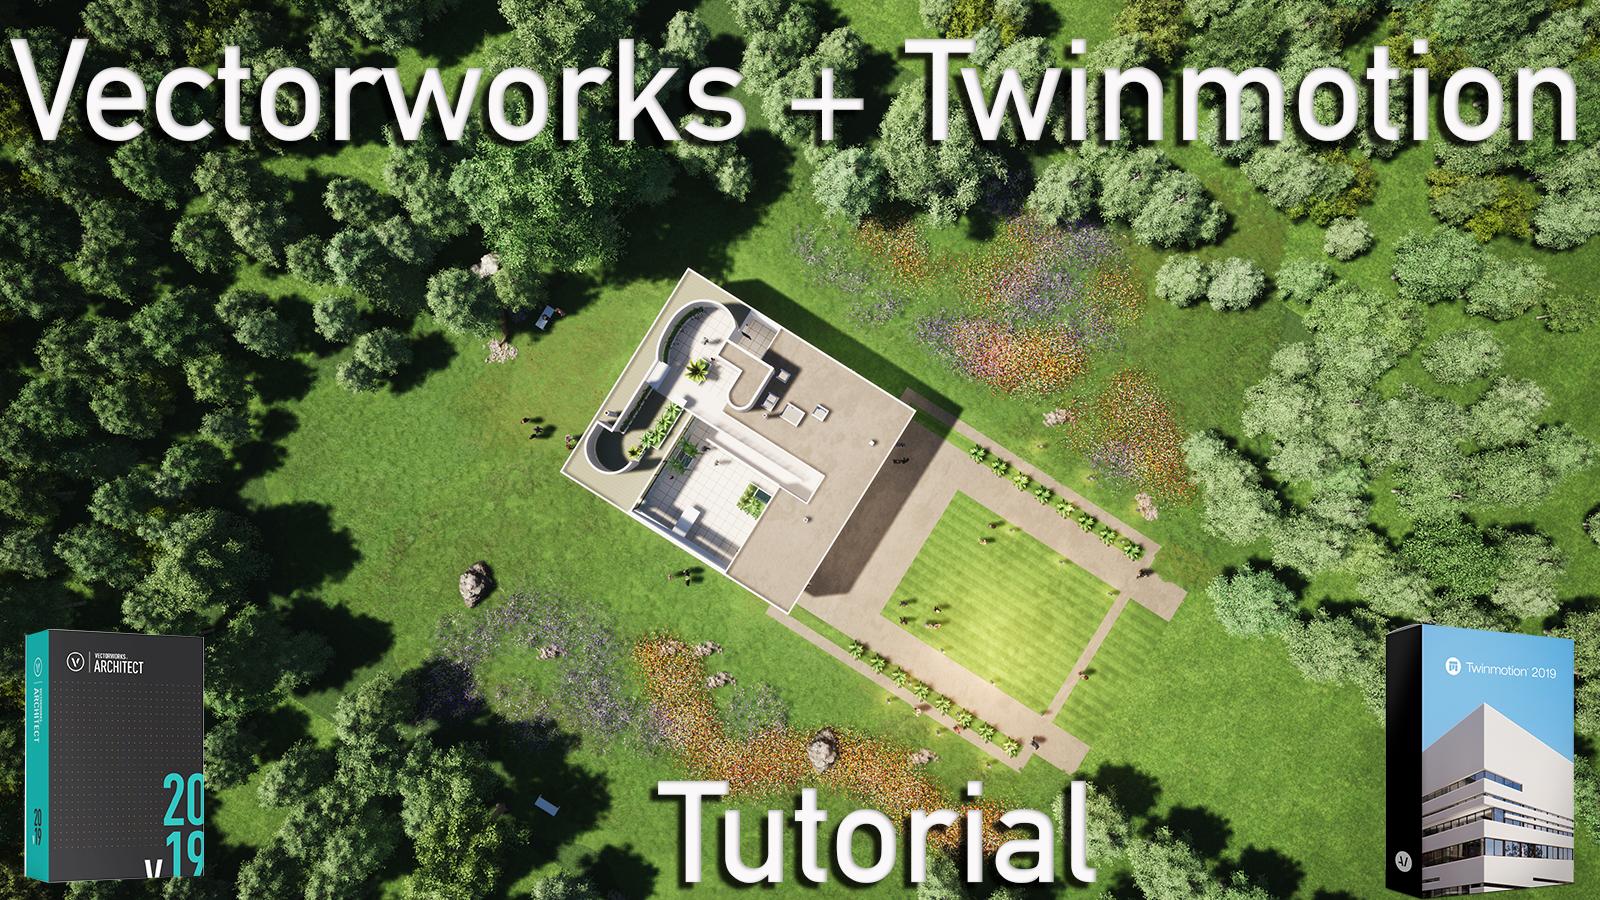 Twinmotion 2019 Tutorial Version: Re-imagining the Villa